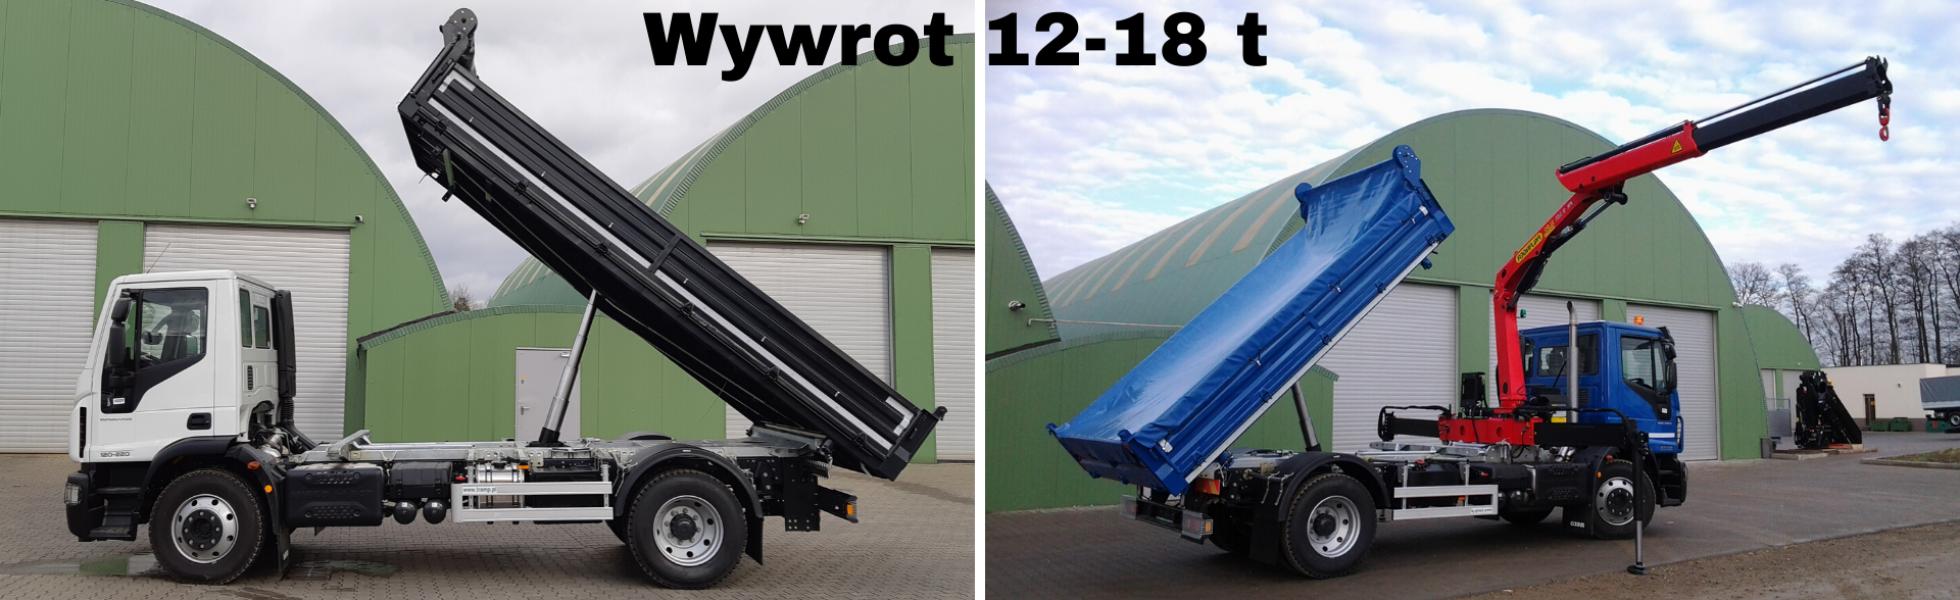 Wywrot